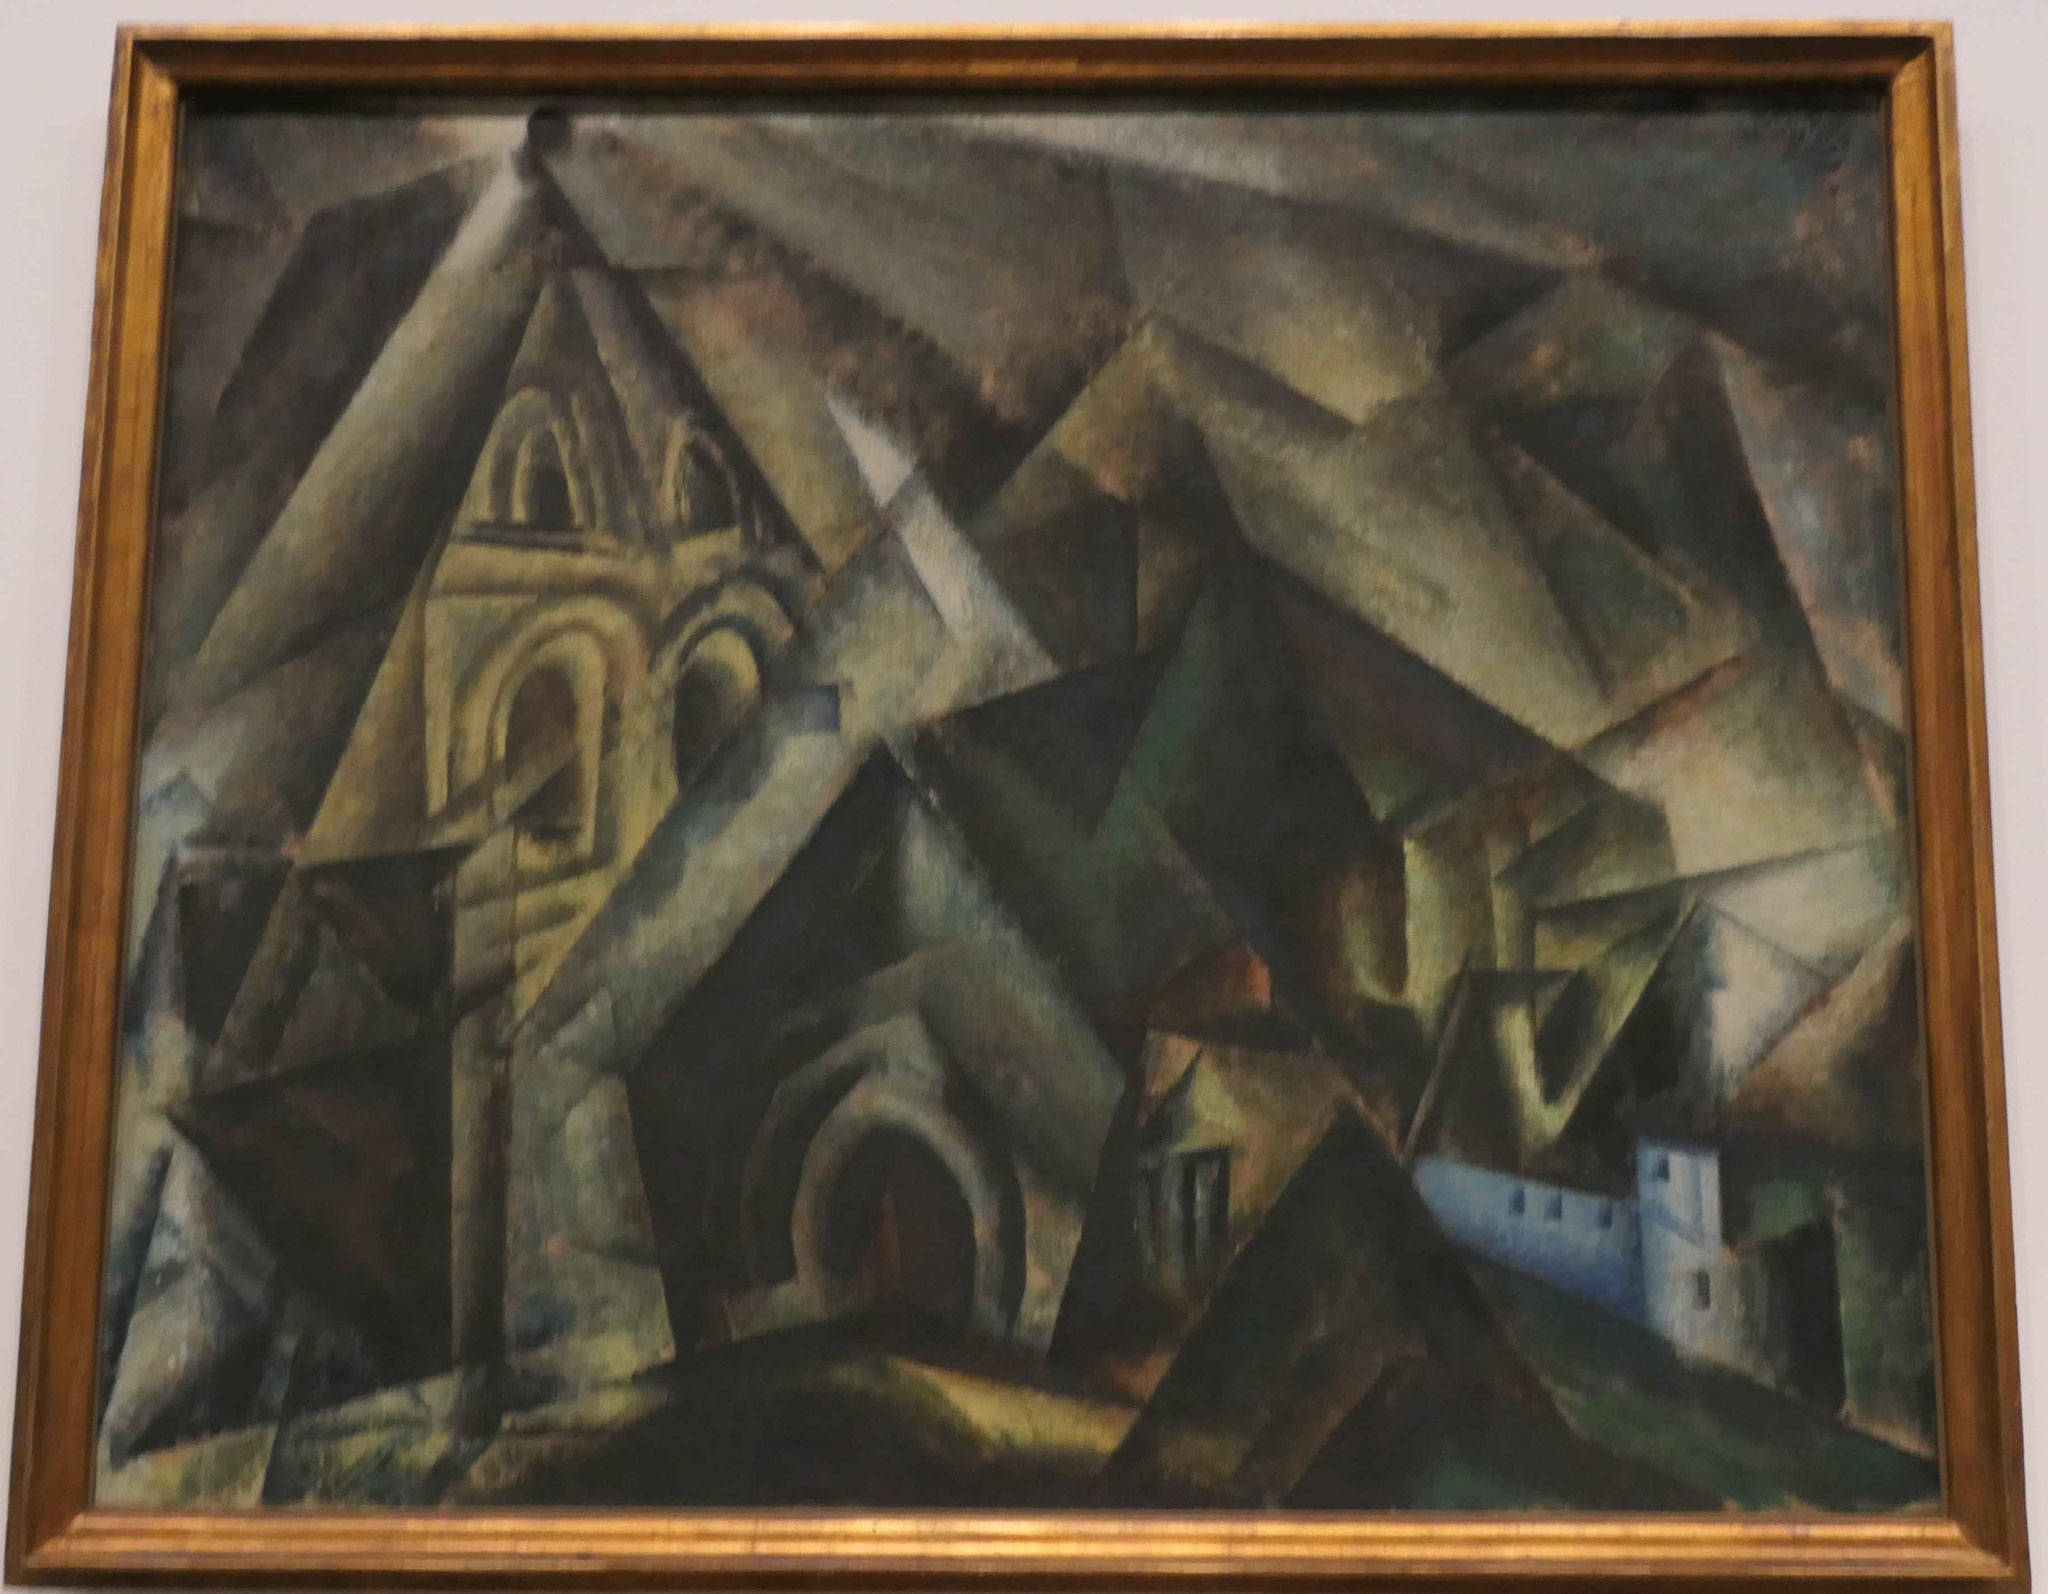 Lyonel Feininger, Eichelborn, 1920, Neue Nationalgalerie Berlin